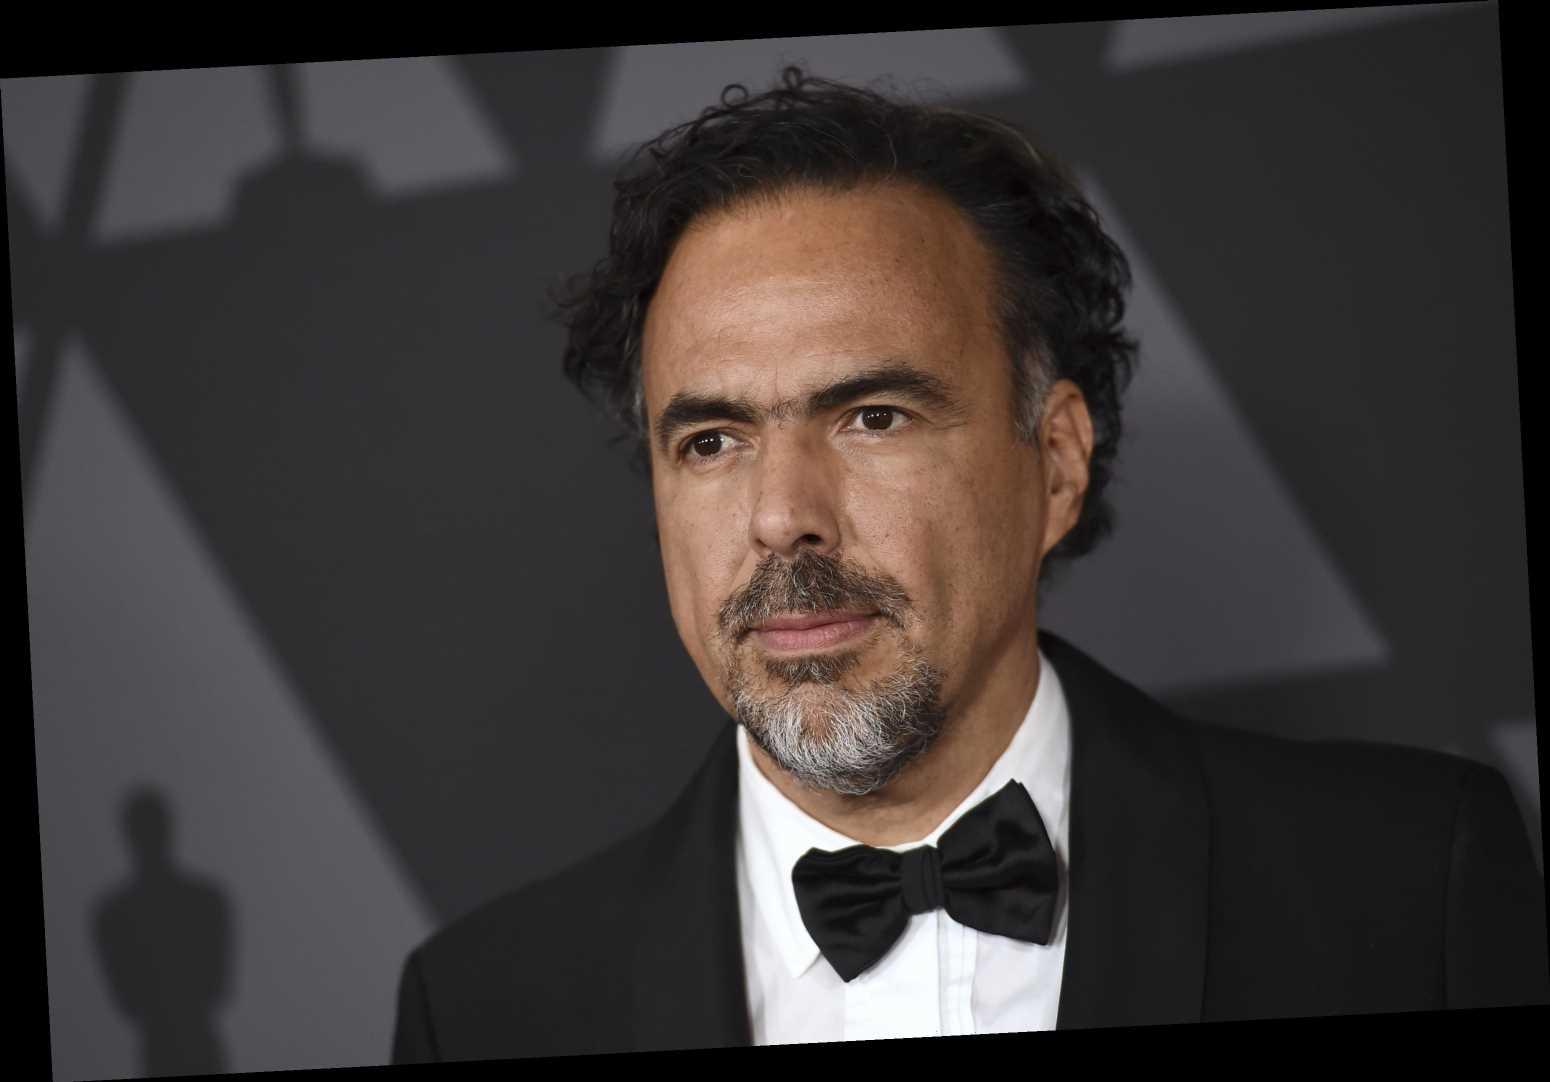 Alejandro González Iñárritu's First Film Since 'Revenant' Is Now Filming, Shot by Darius Khondji